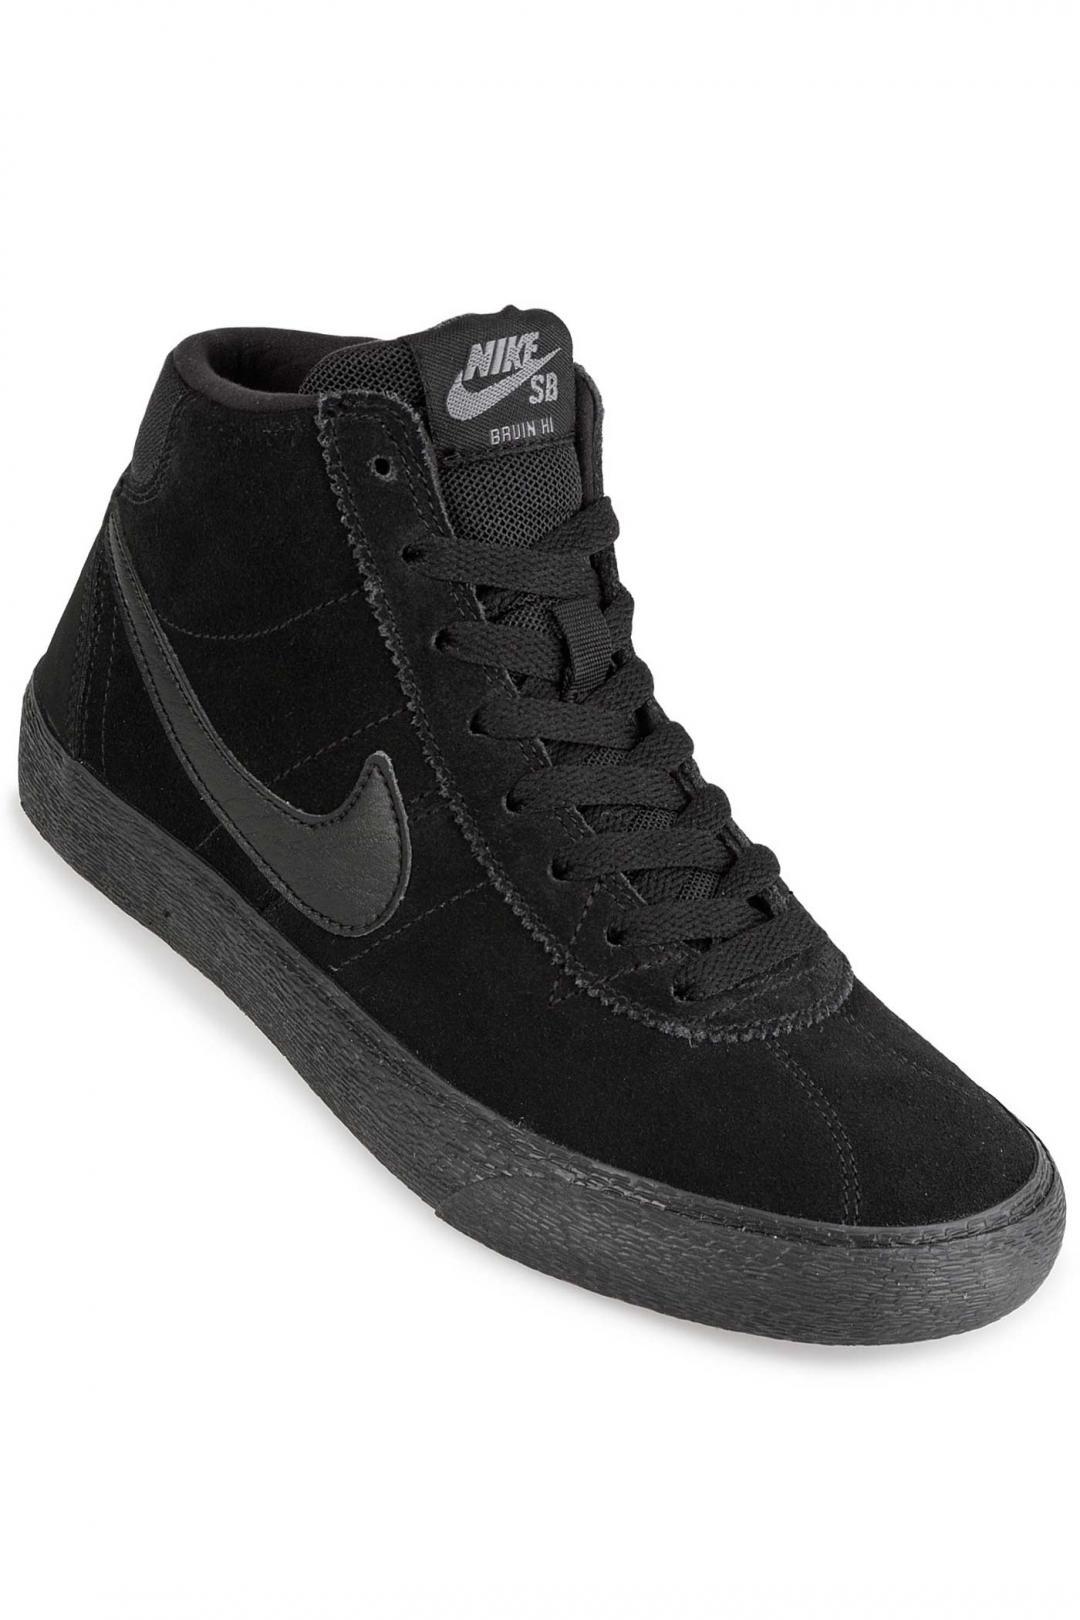 Donna Nike SB Bruin Hi black black gunsmoke | Sneakers high top